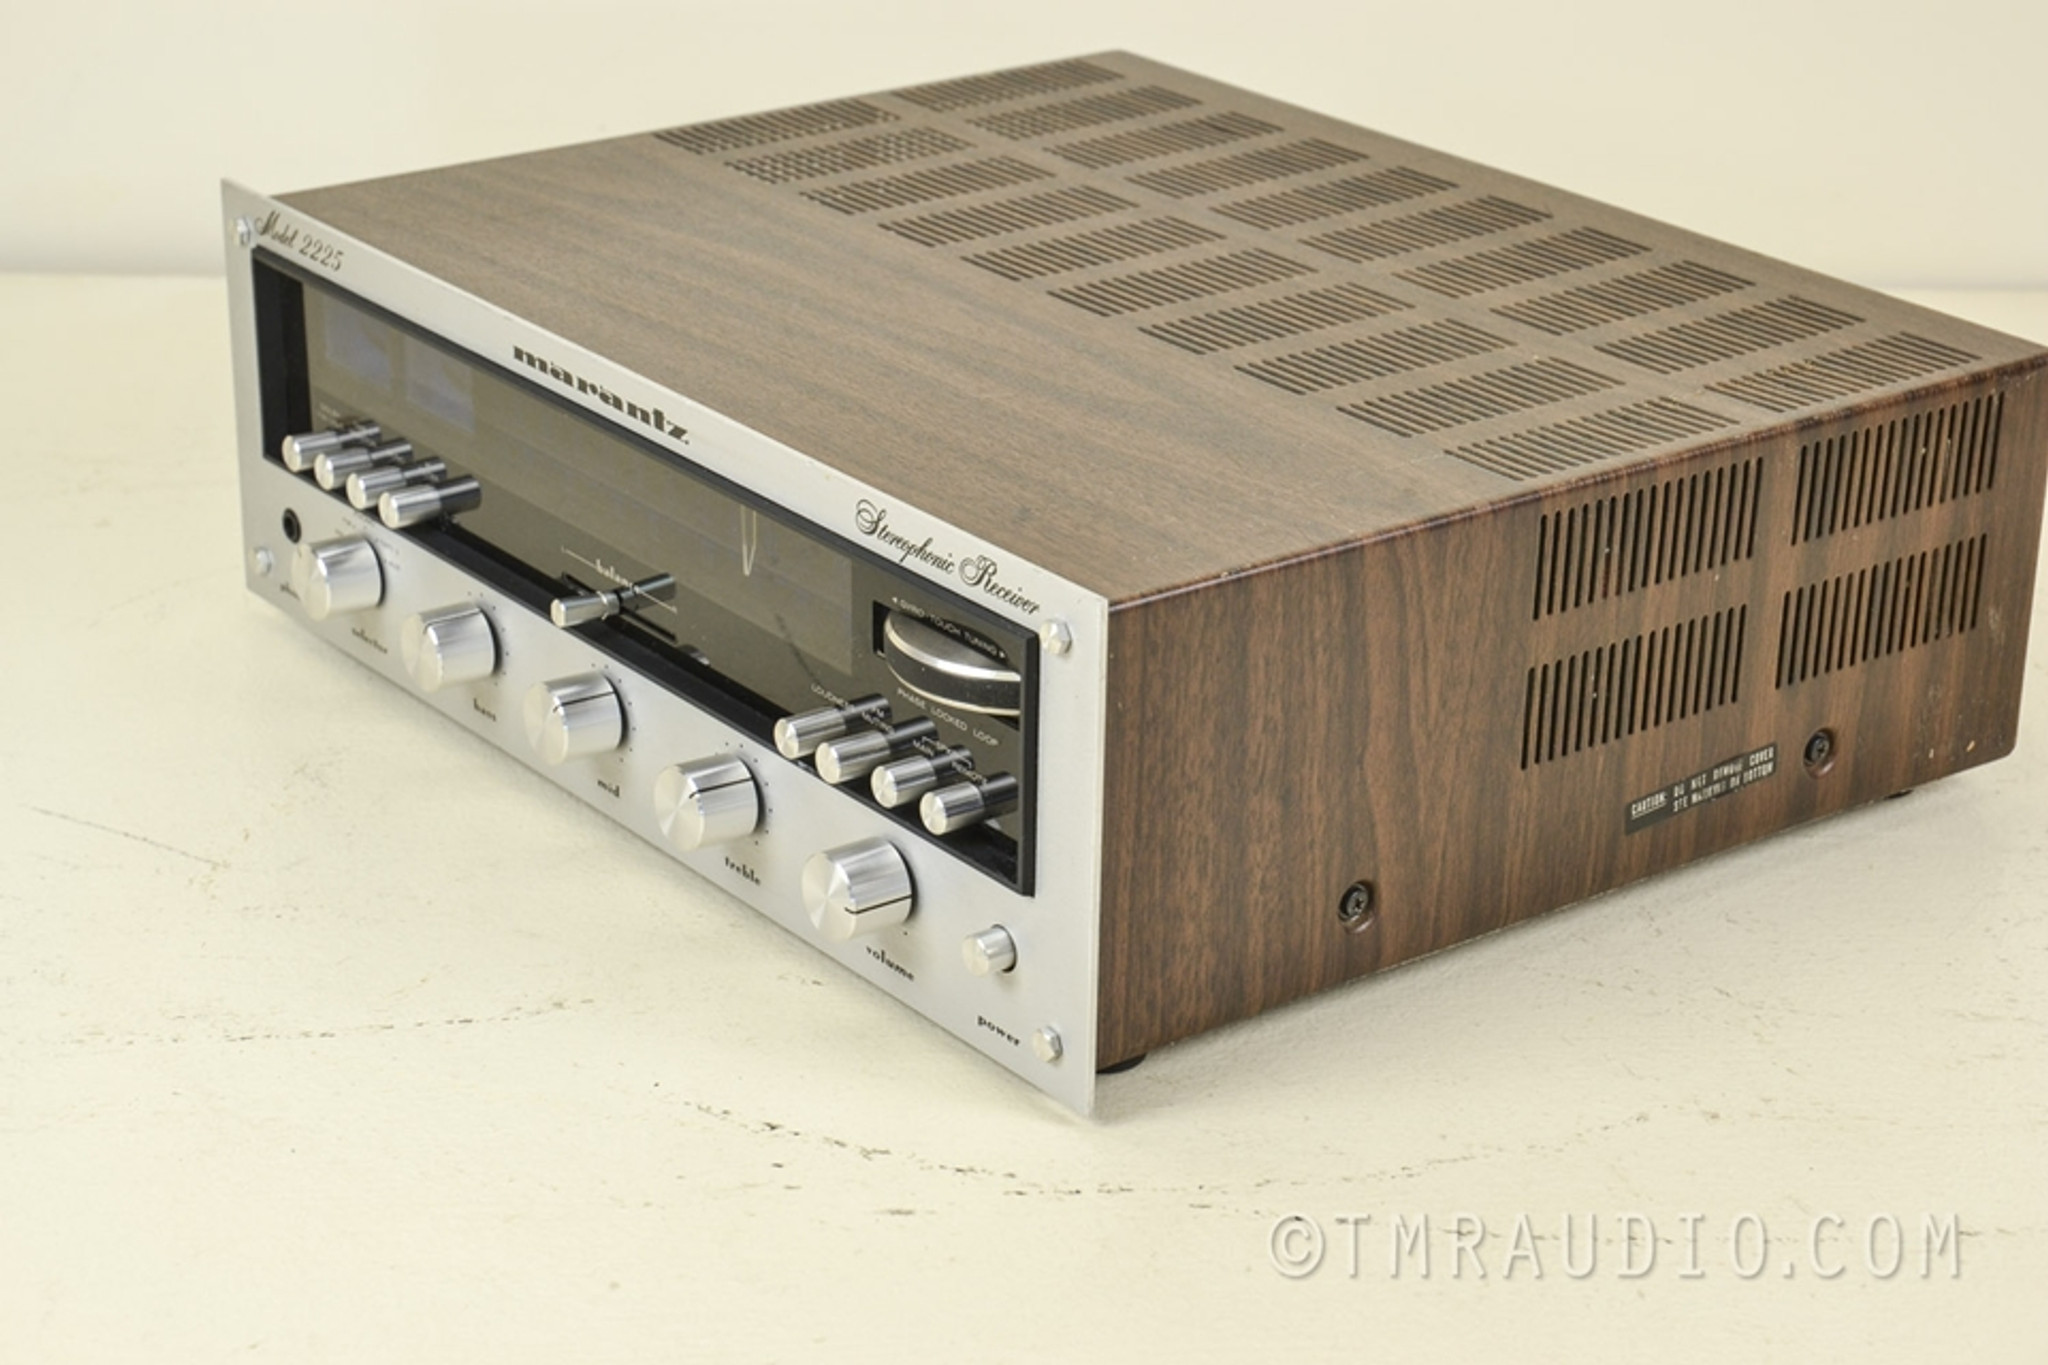 Marantz 2225 Vintage Am Fm Stereo Receiver Just